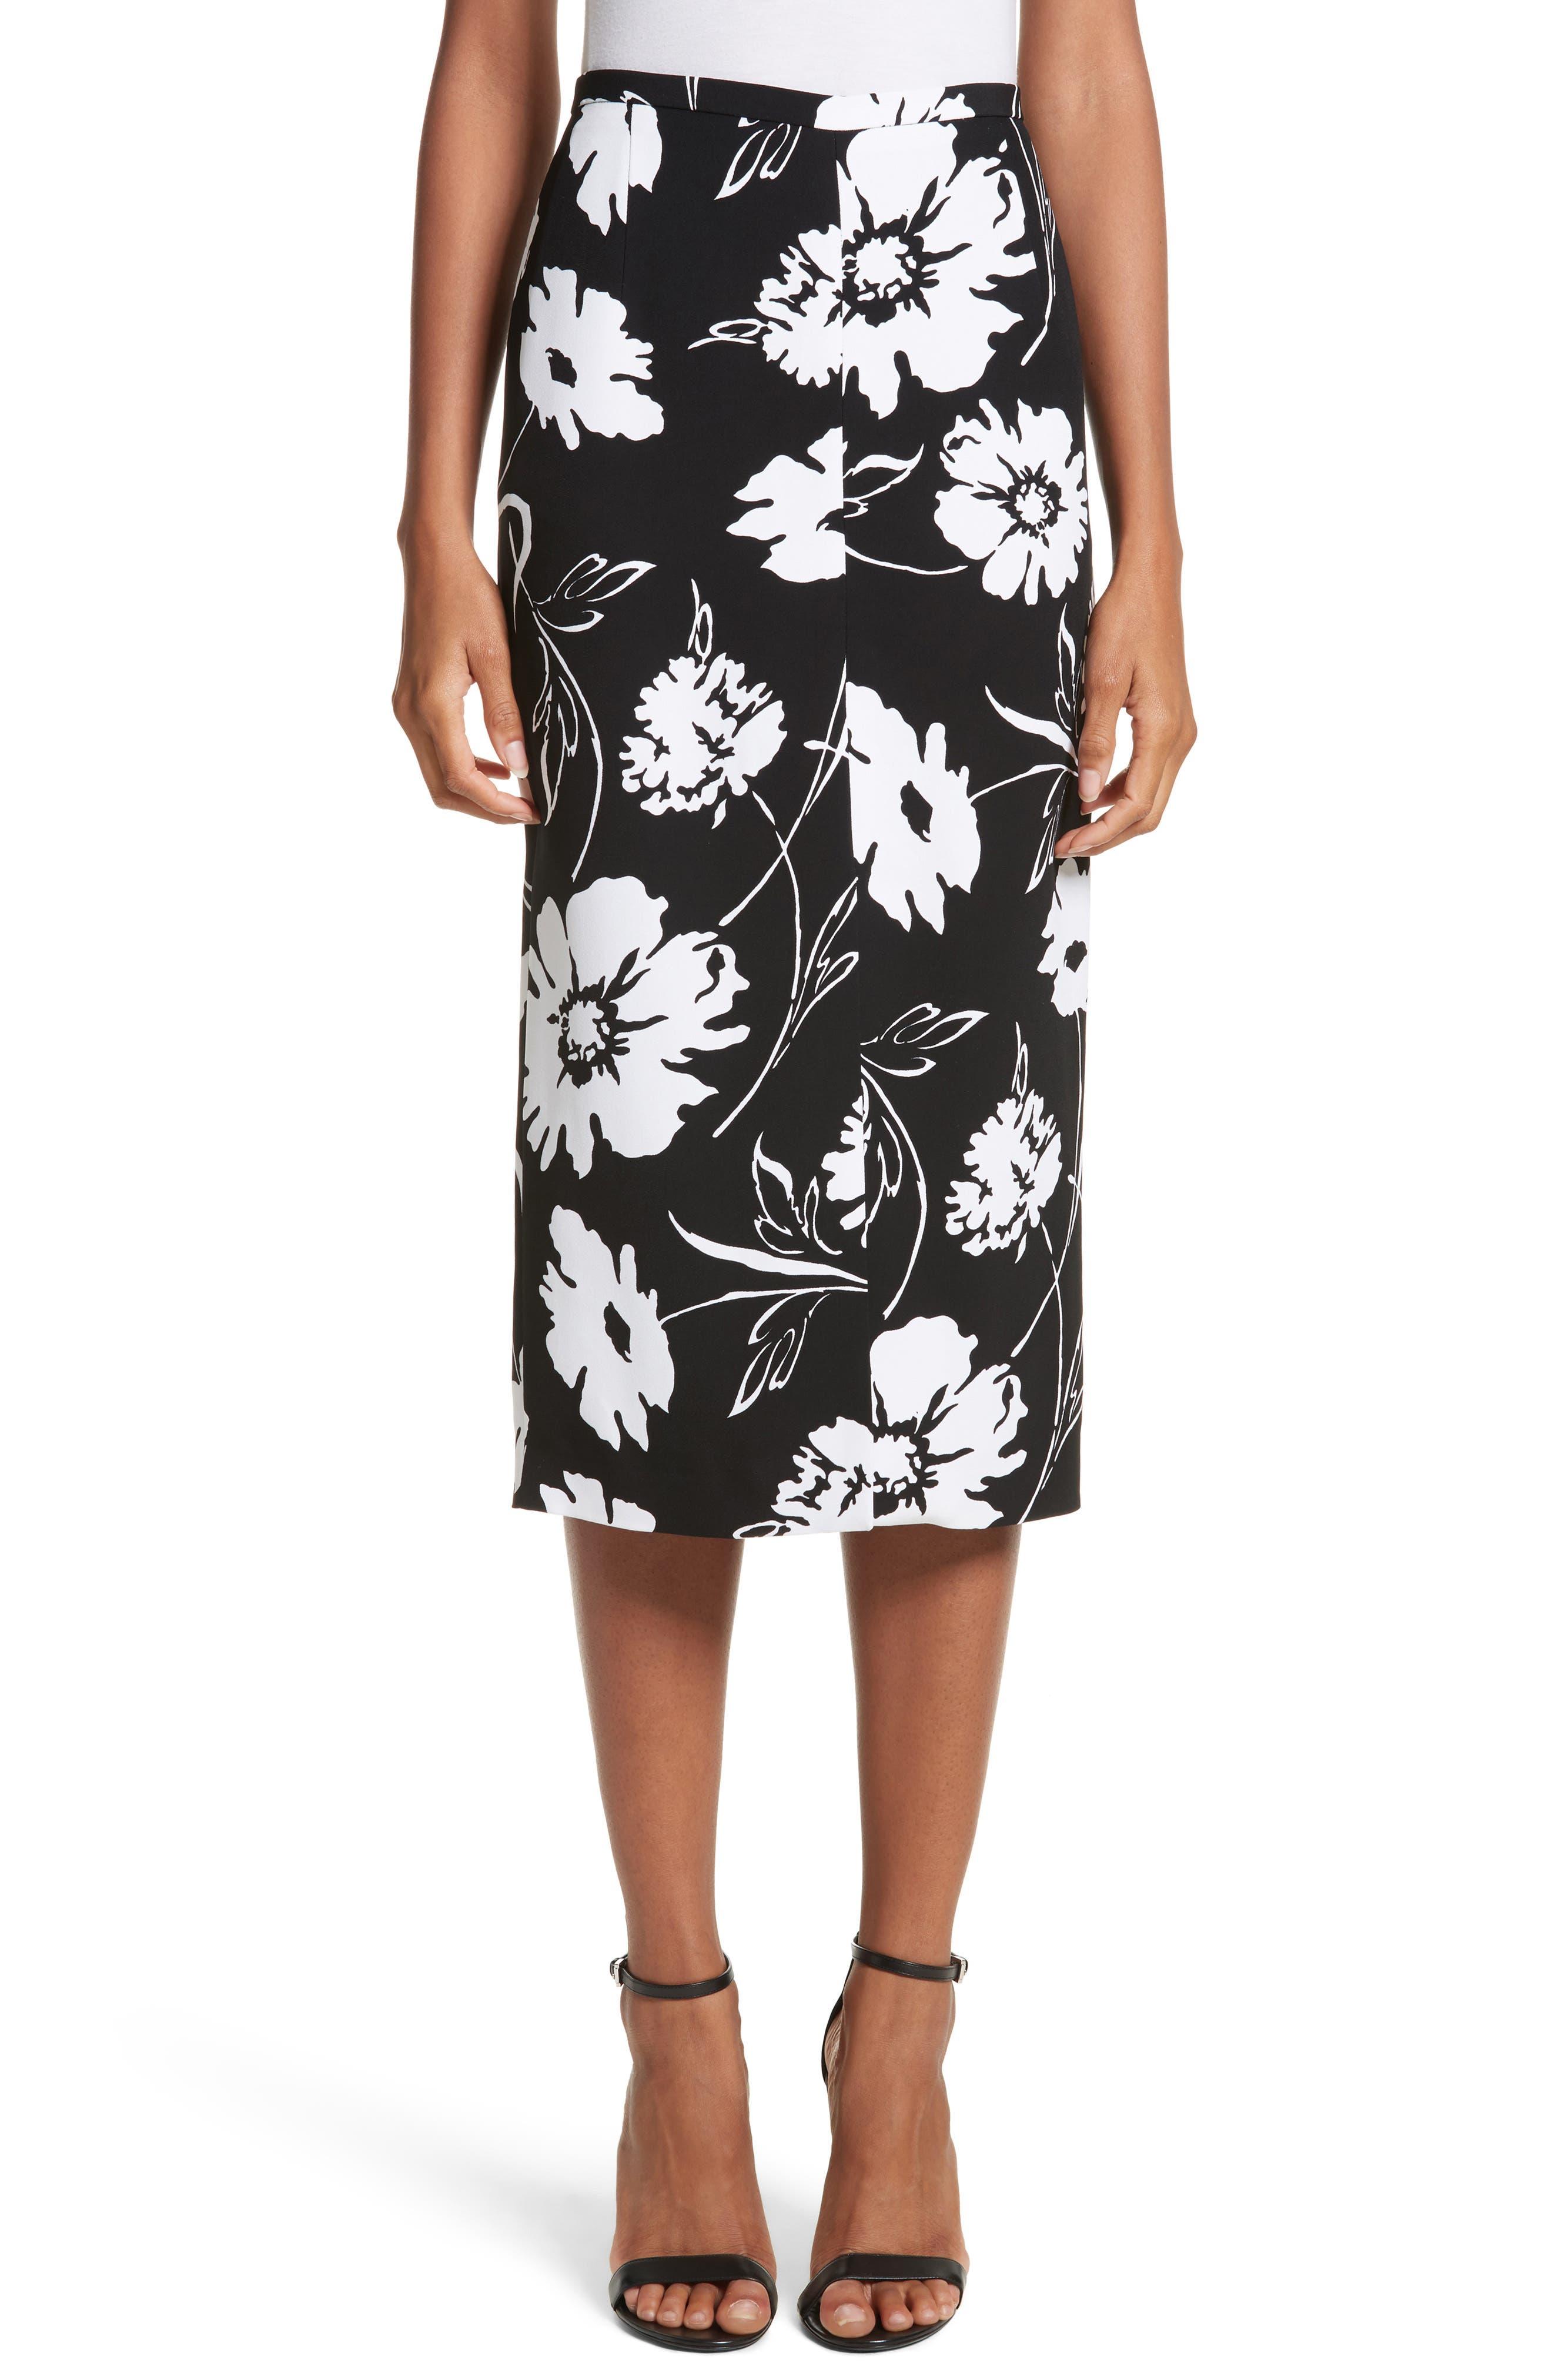 Main Image - Michael Kors Floral Print Pencil Skirt